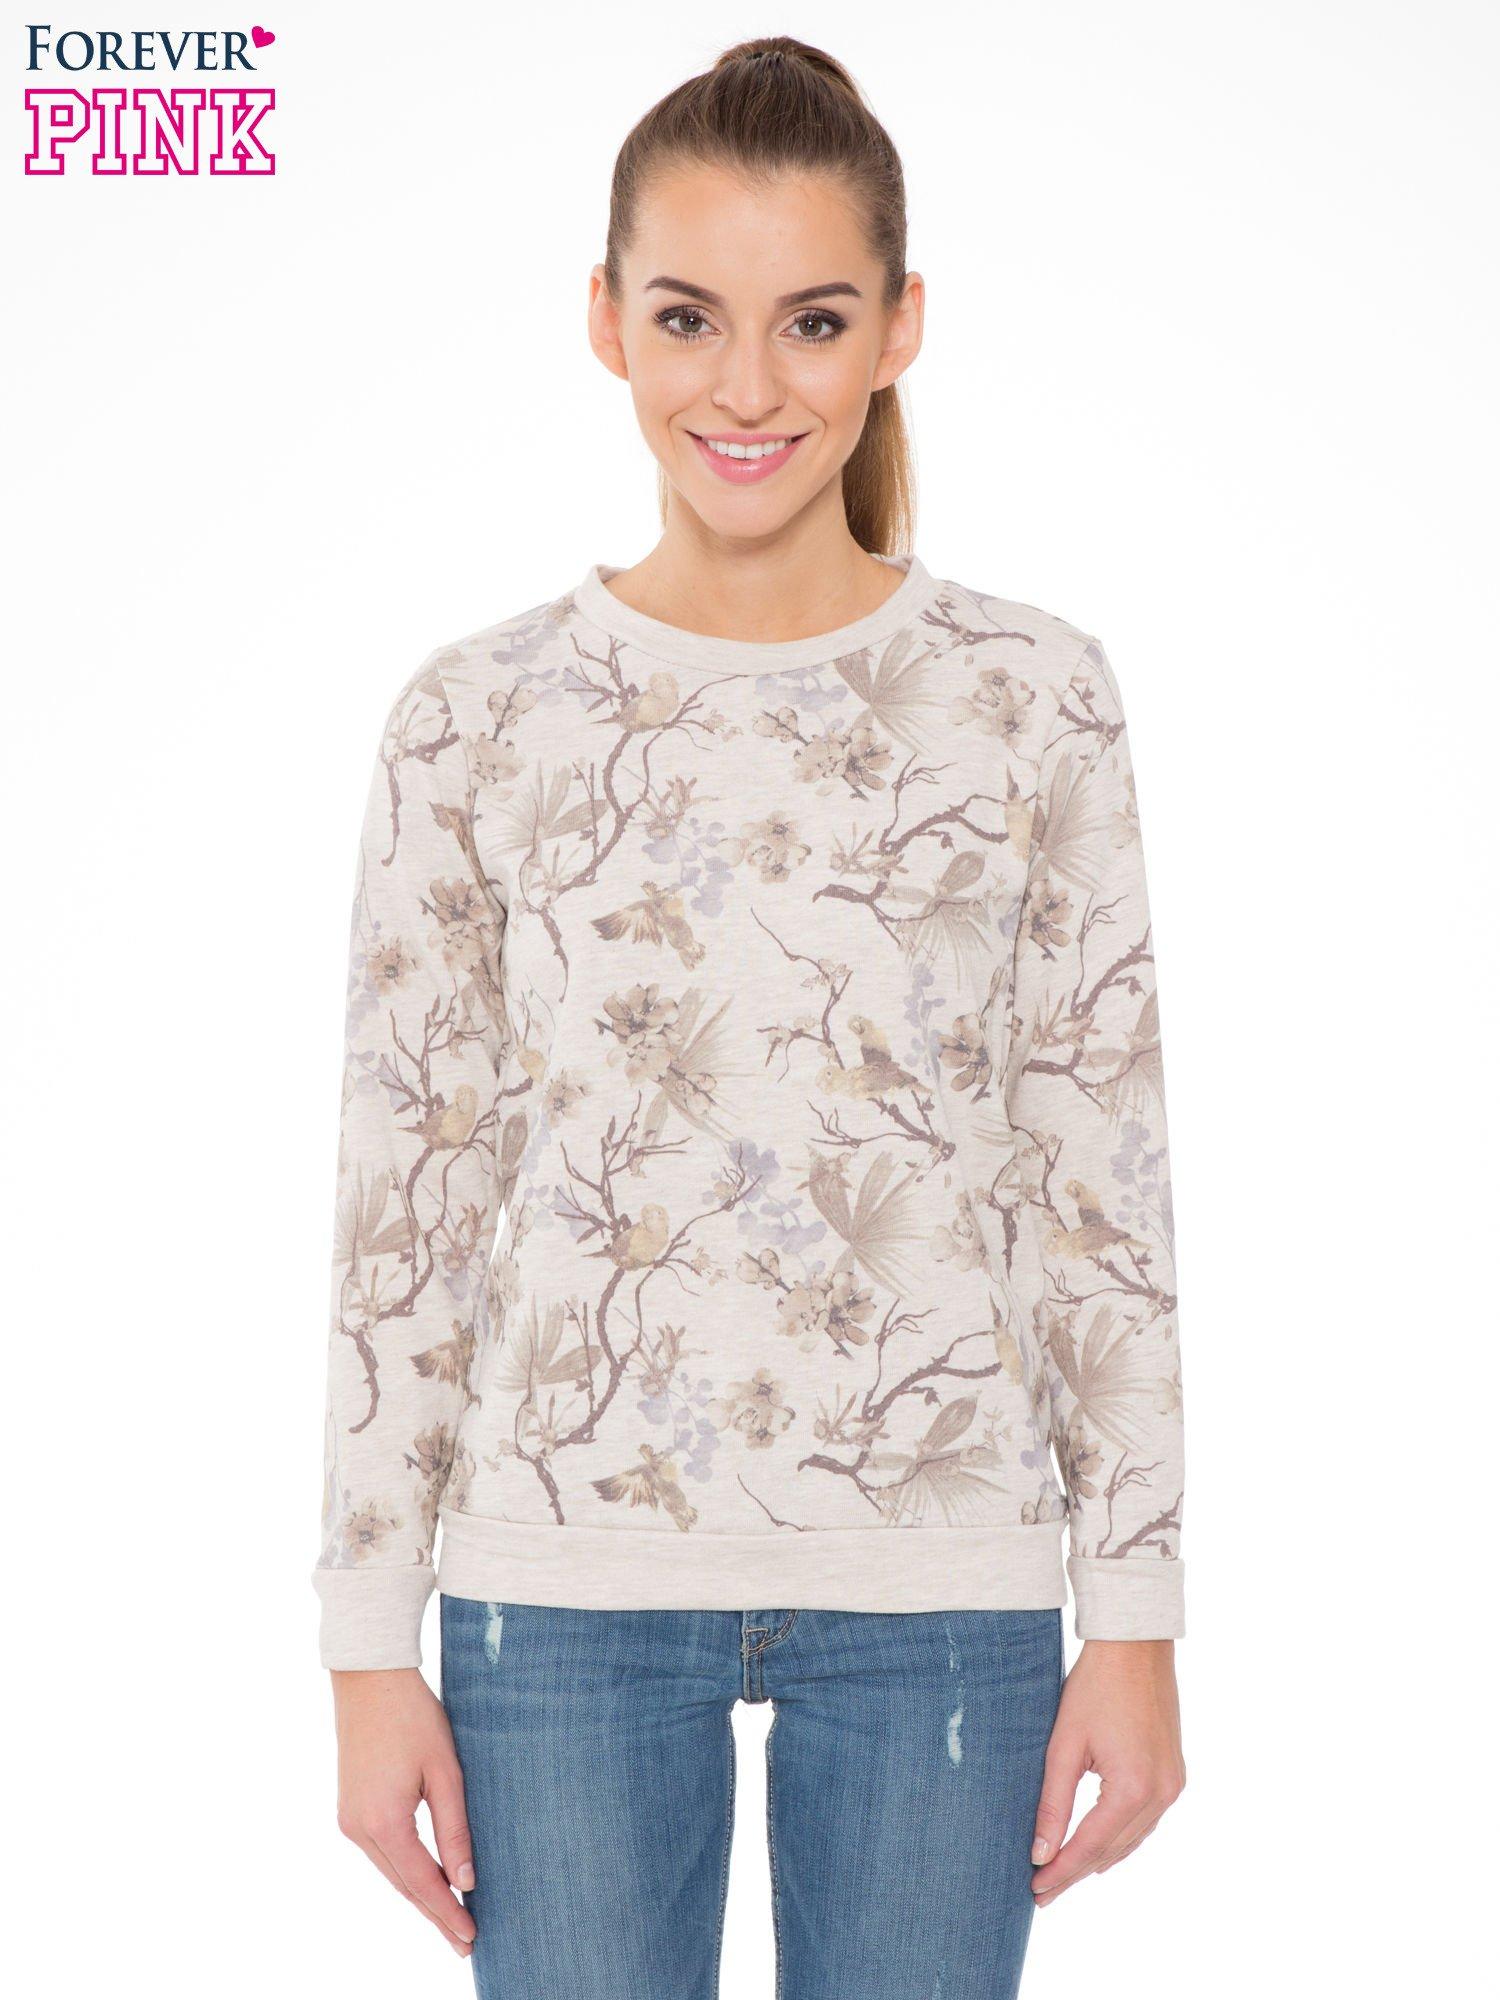 Beżowa bluza z nadrukiem all over floral print                                  zdj.                                  1